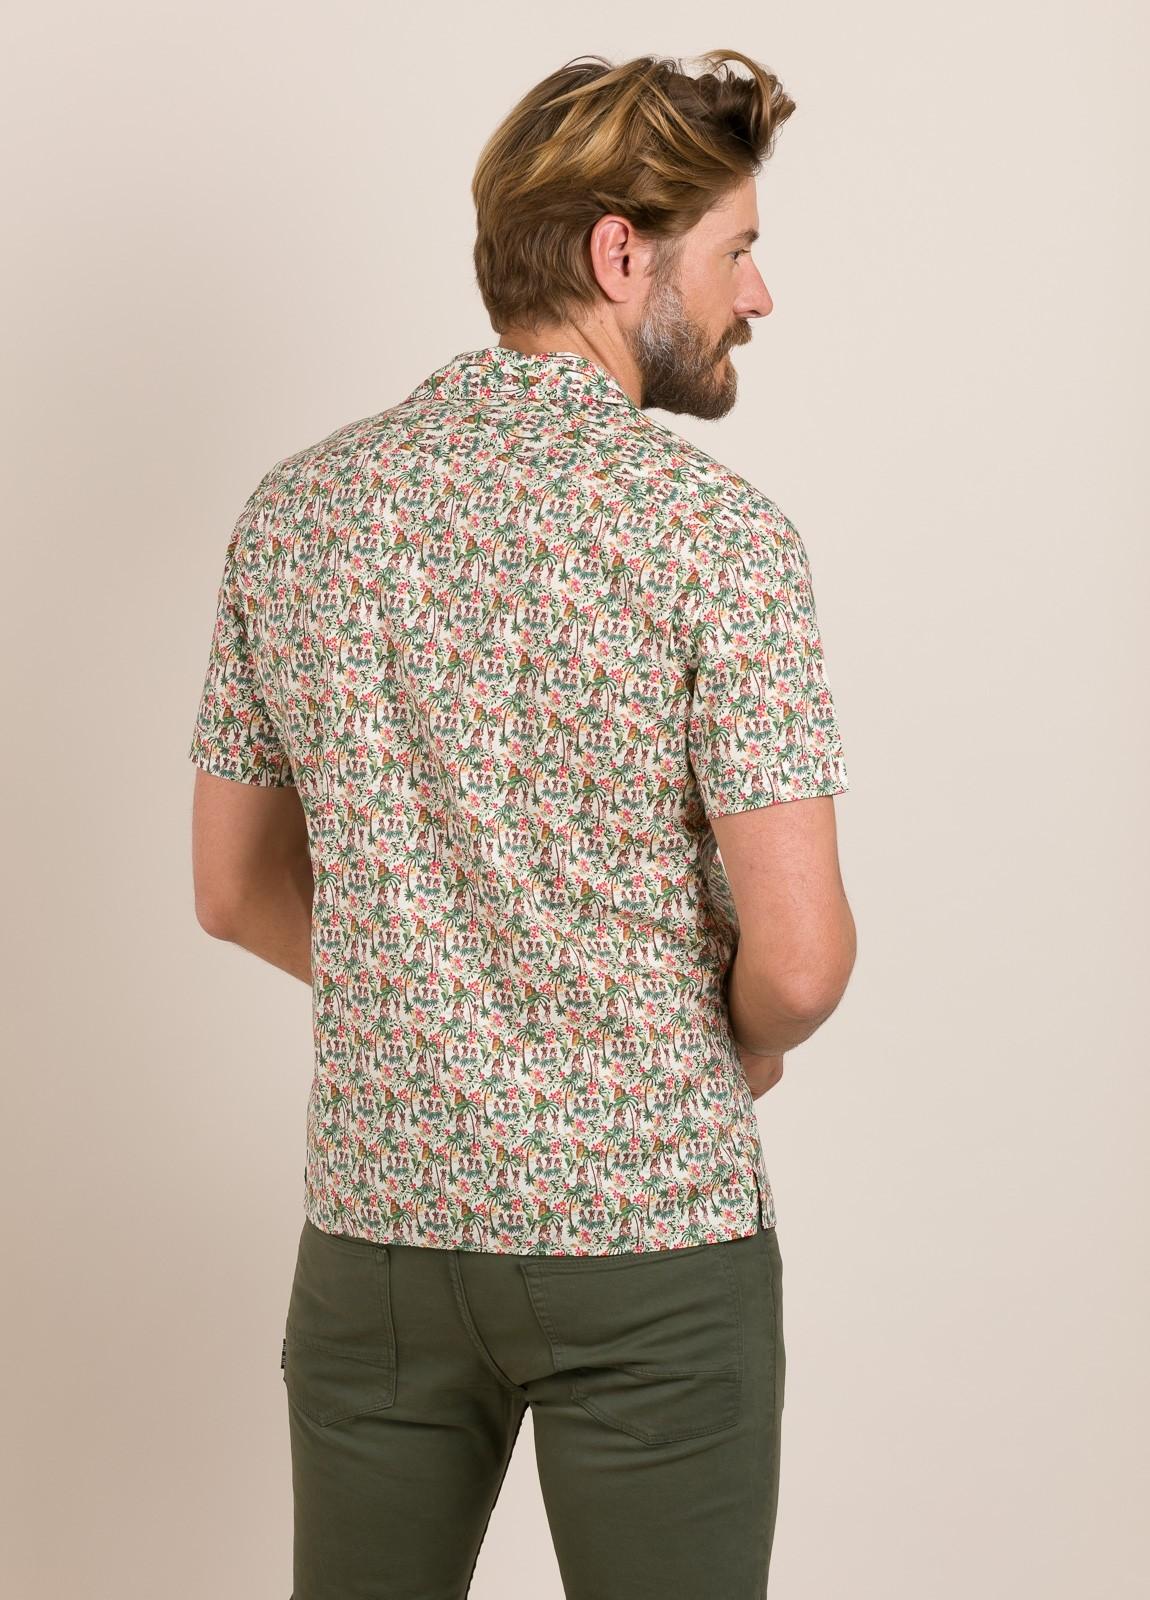 Camisa sport FUREST COLECCIÓN modelo HAWAI TOM crudo - Ítem2